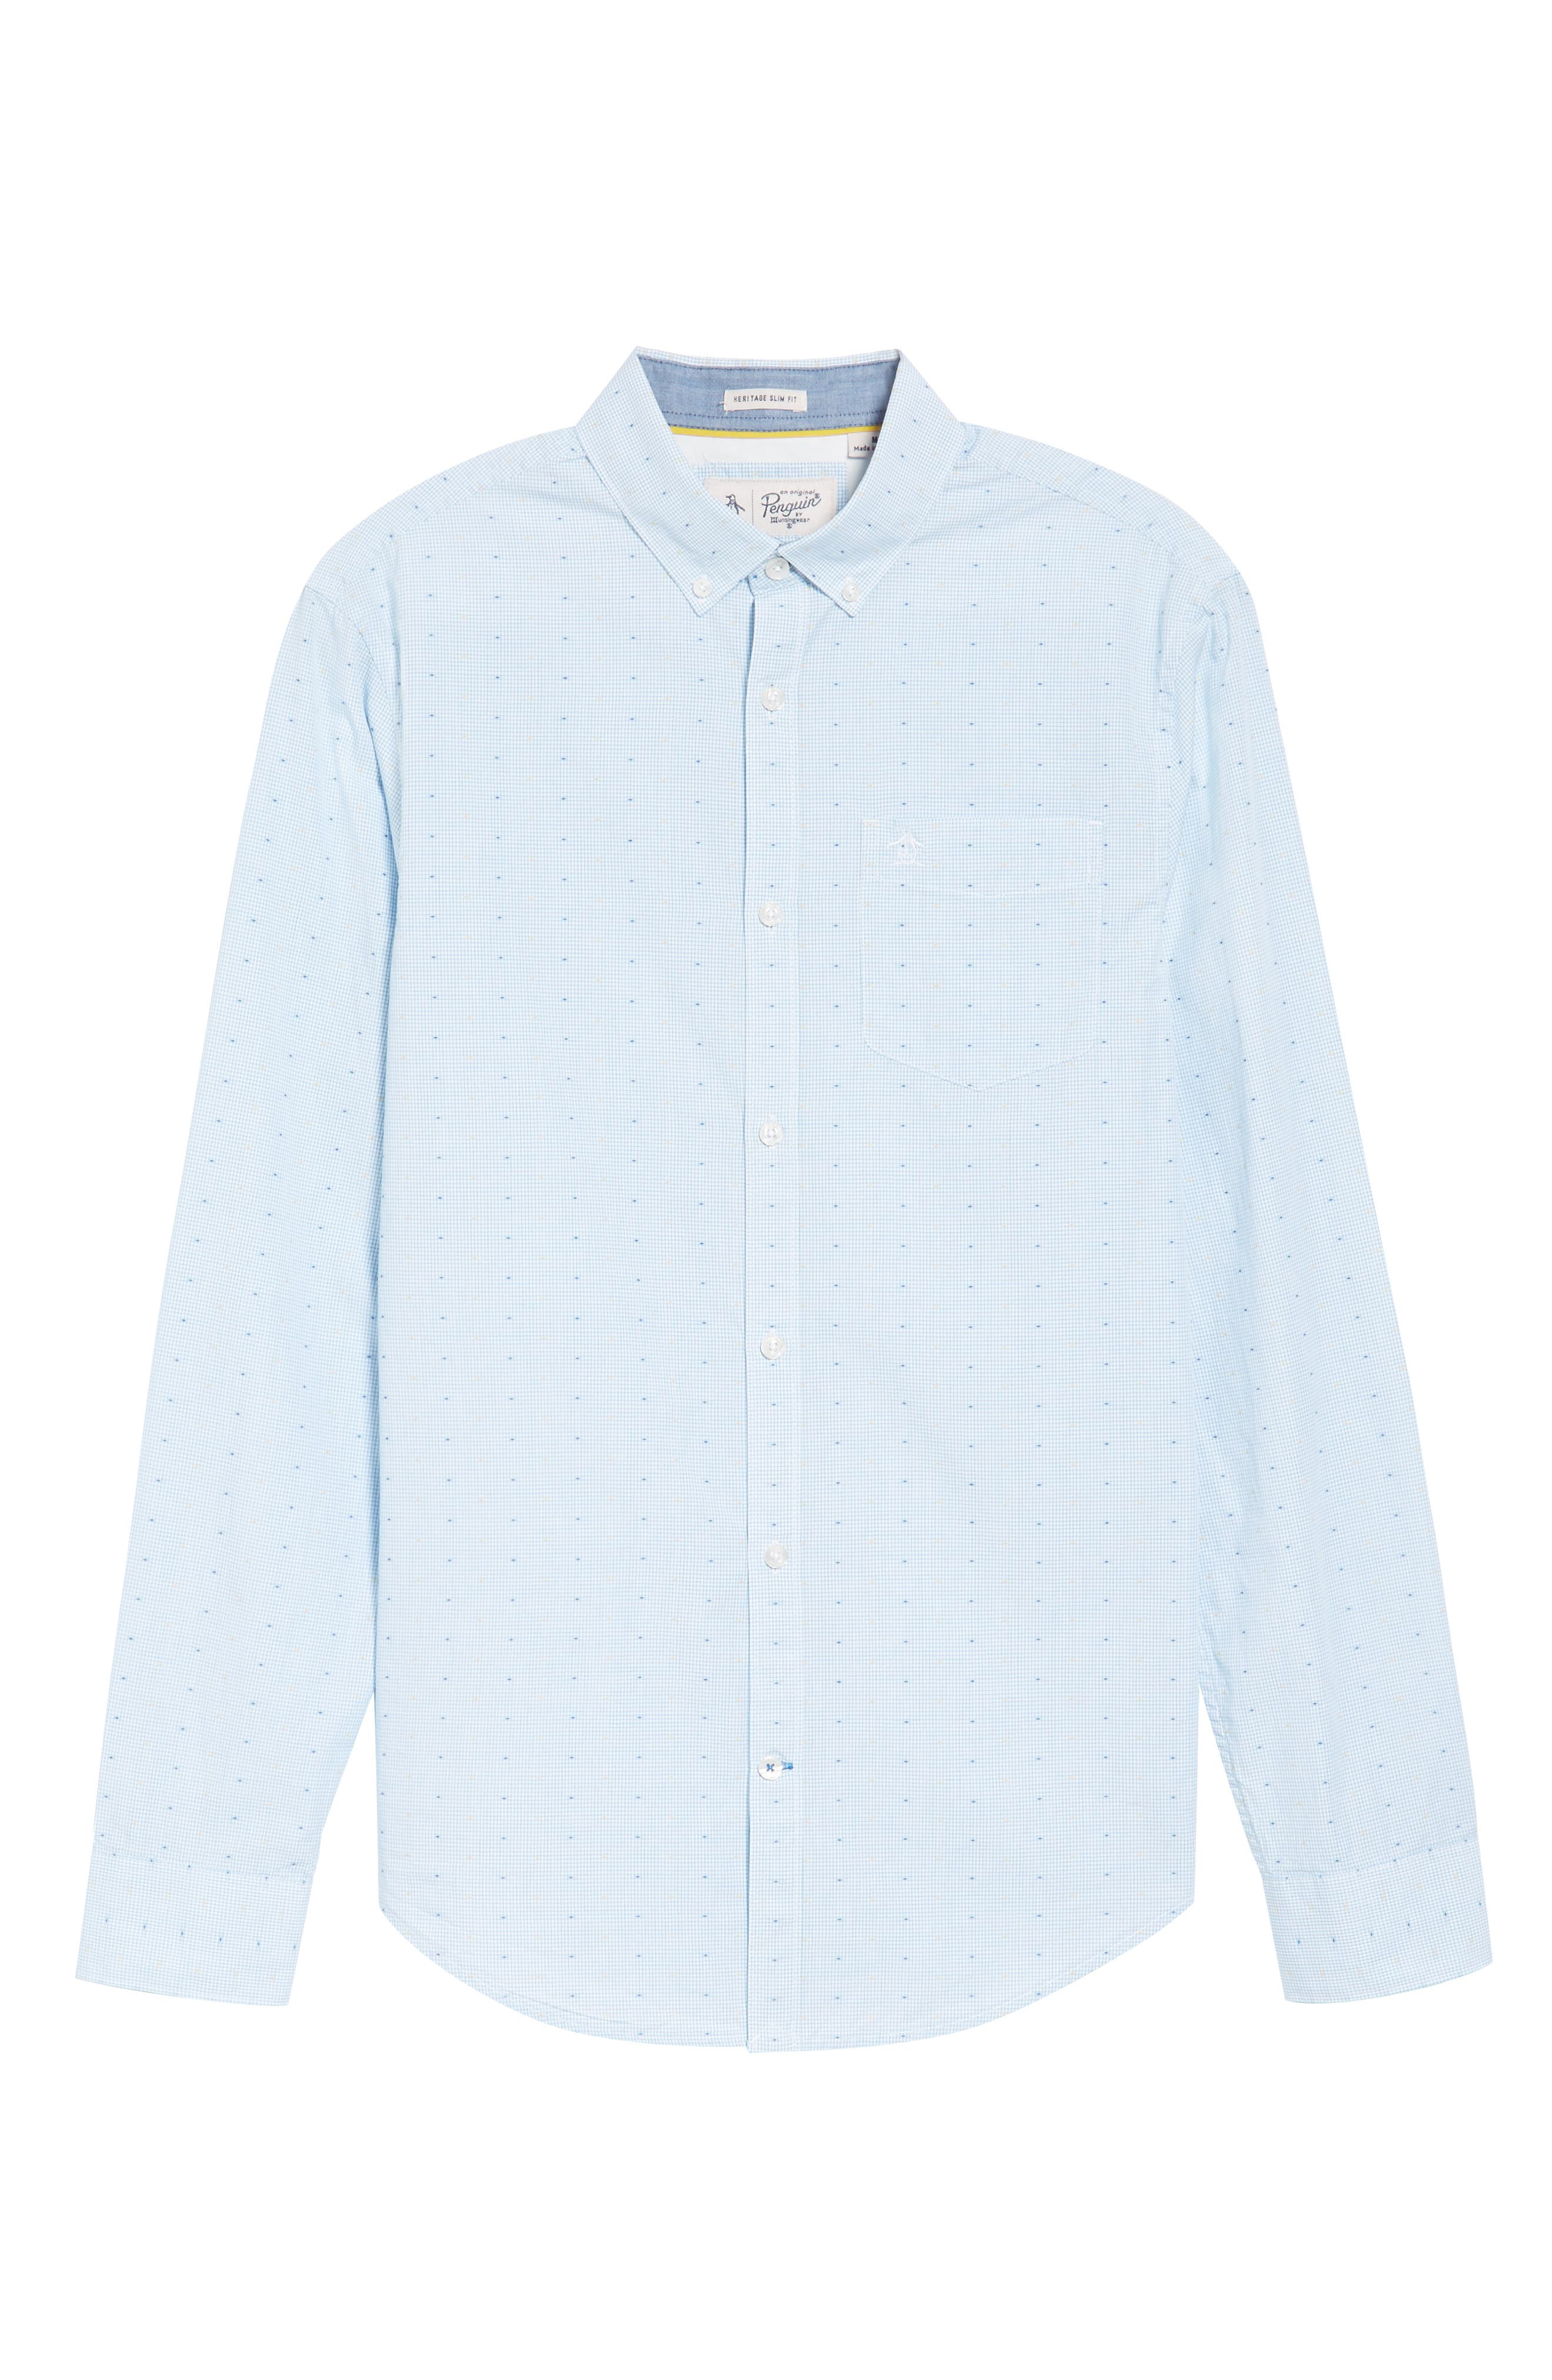 Clipped Dobby Woven Shirt,                             Alternate thumbnail 6, color,                             118